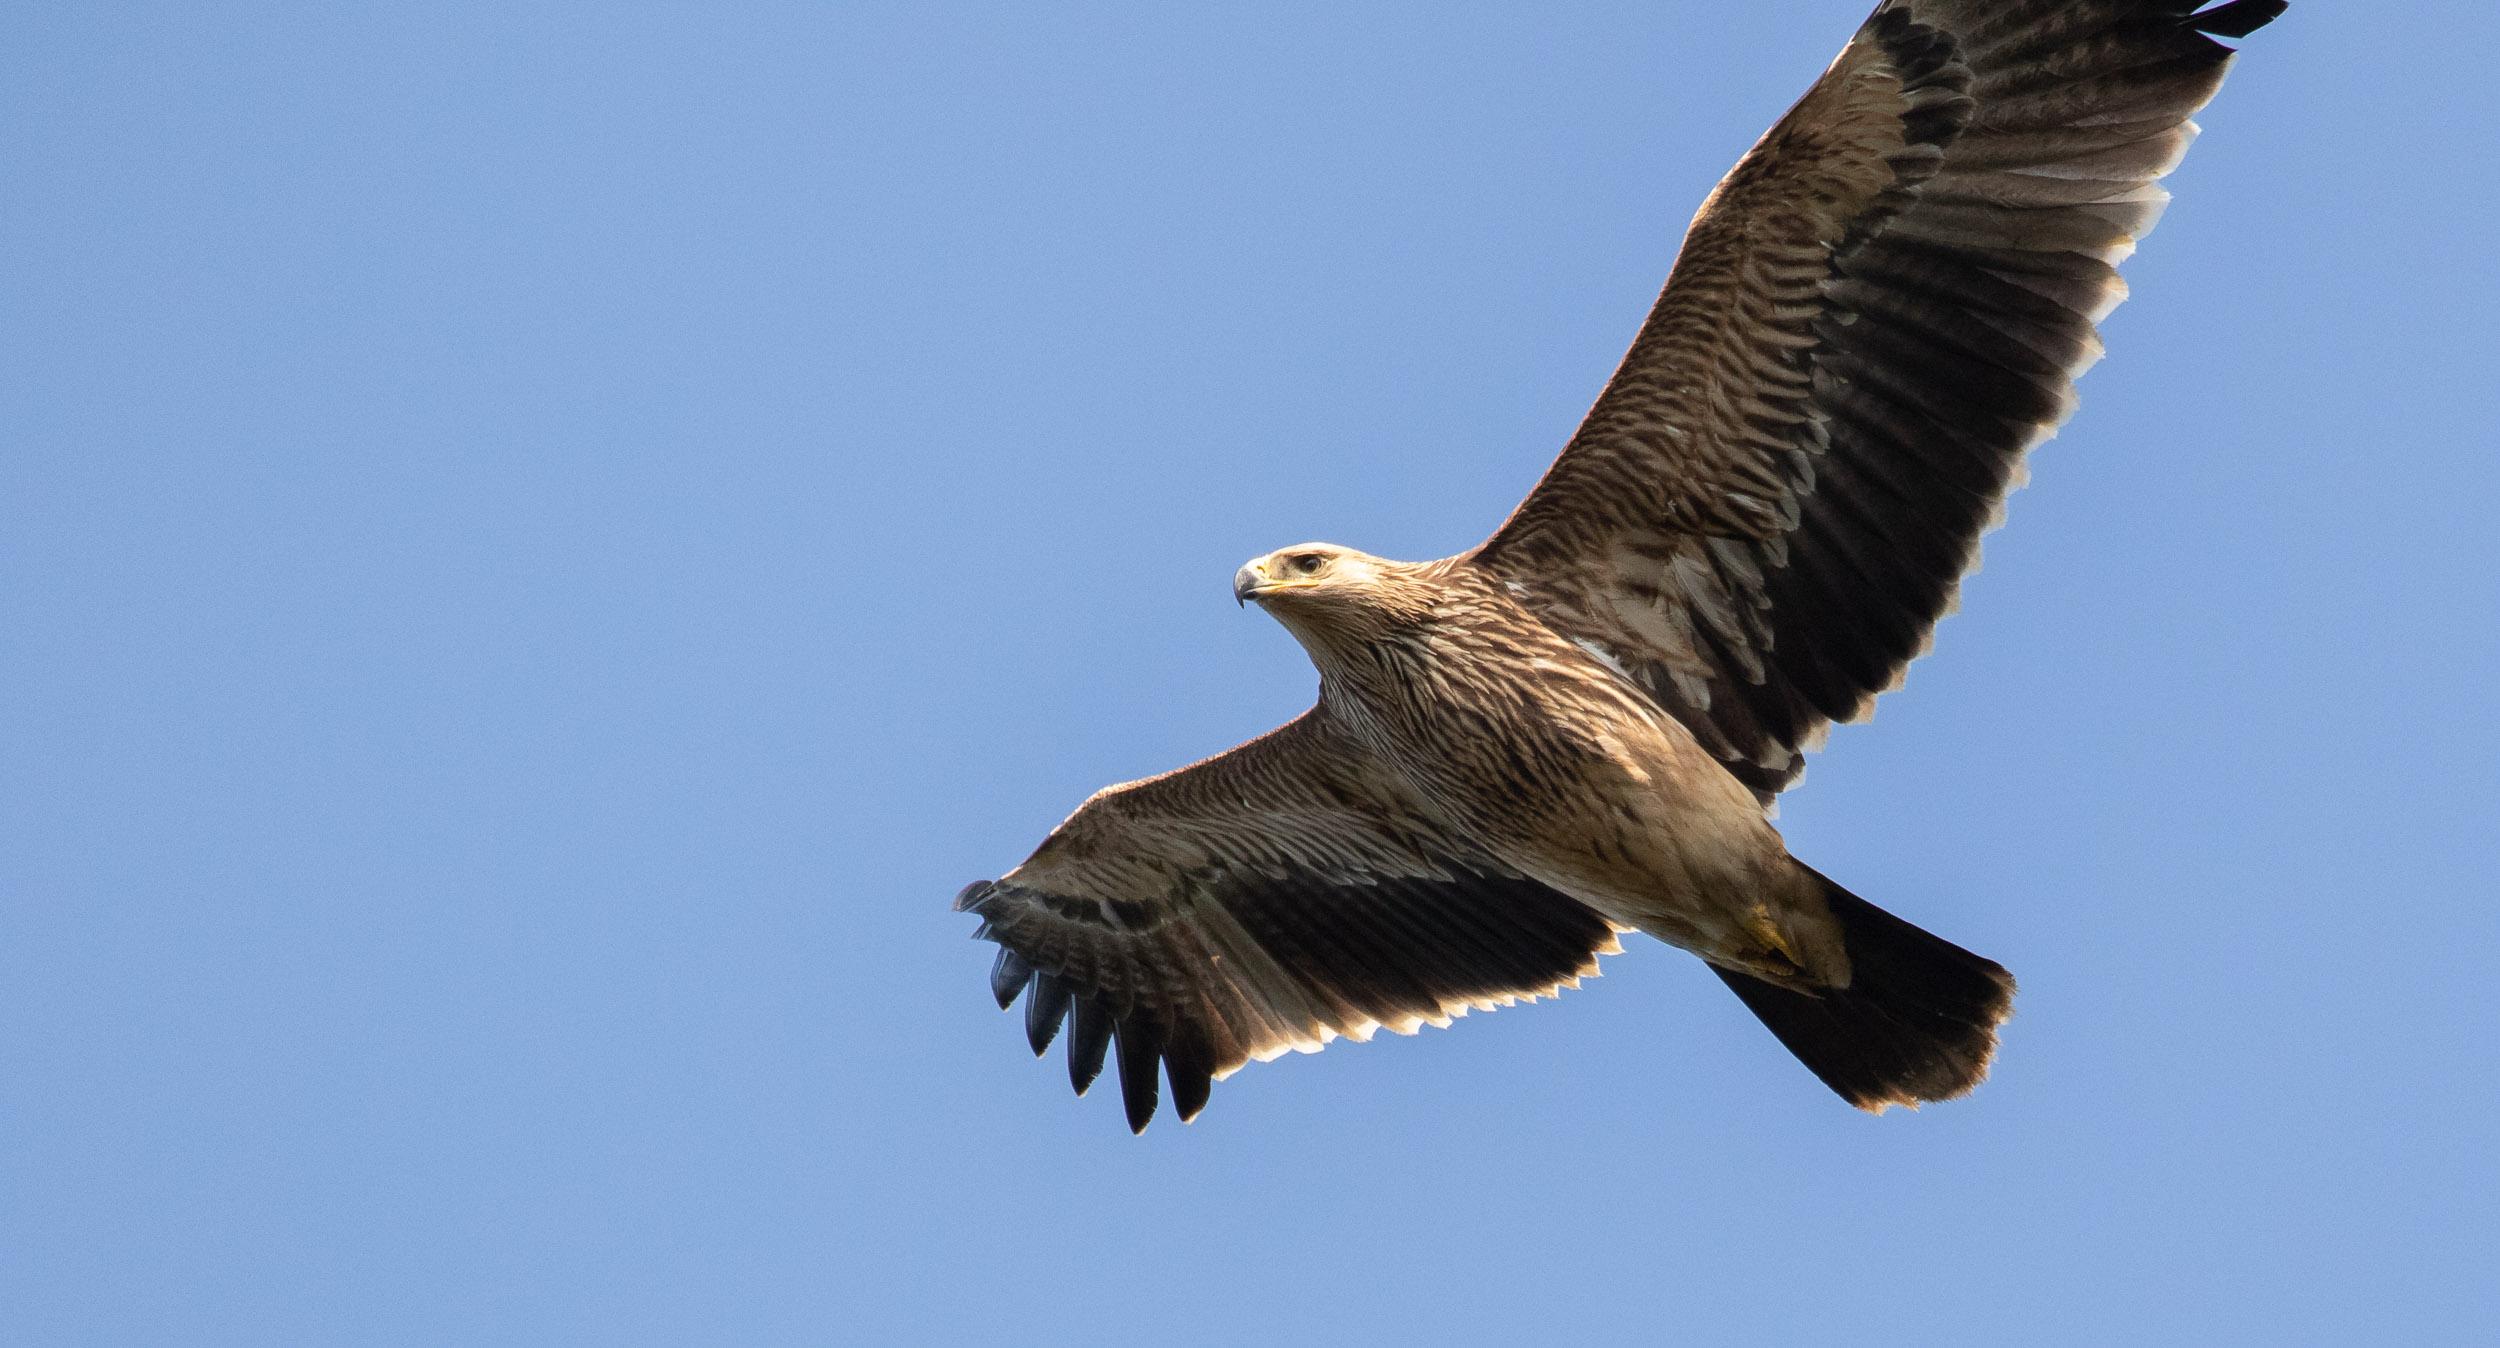 Juvenile Imperial Eagle. Photo by Bart Hoekstra.